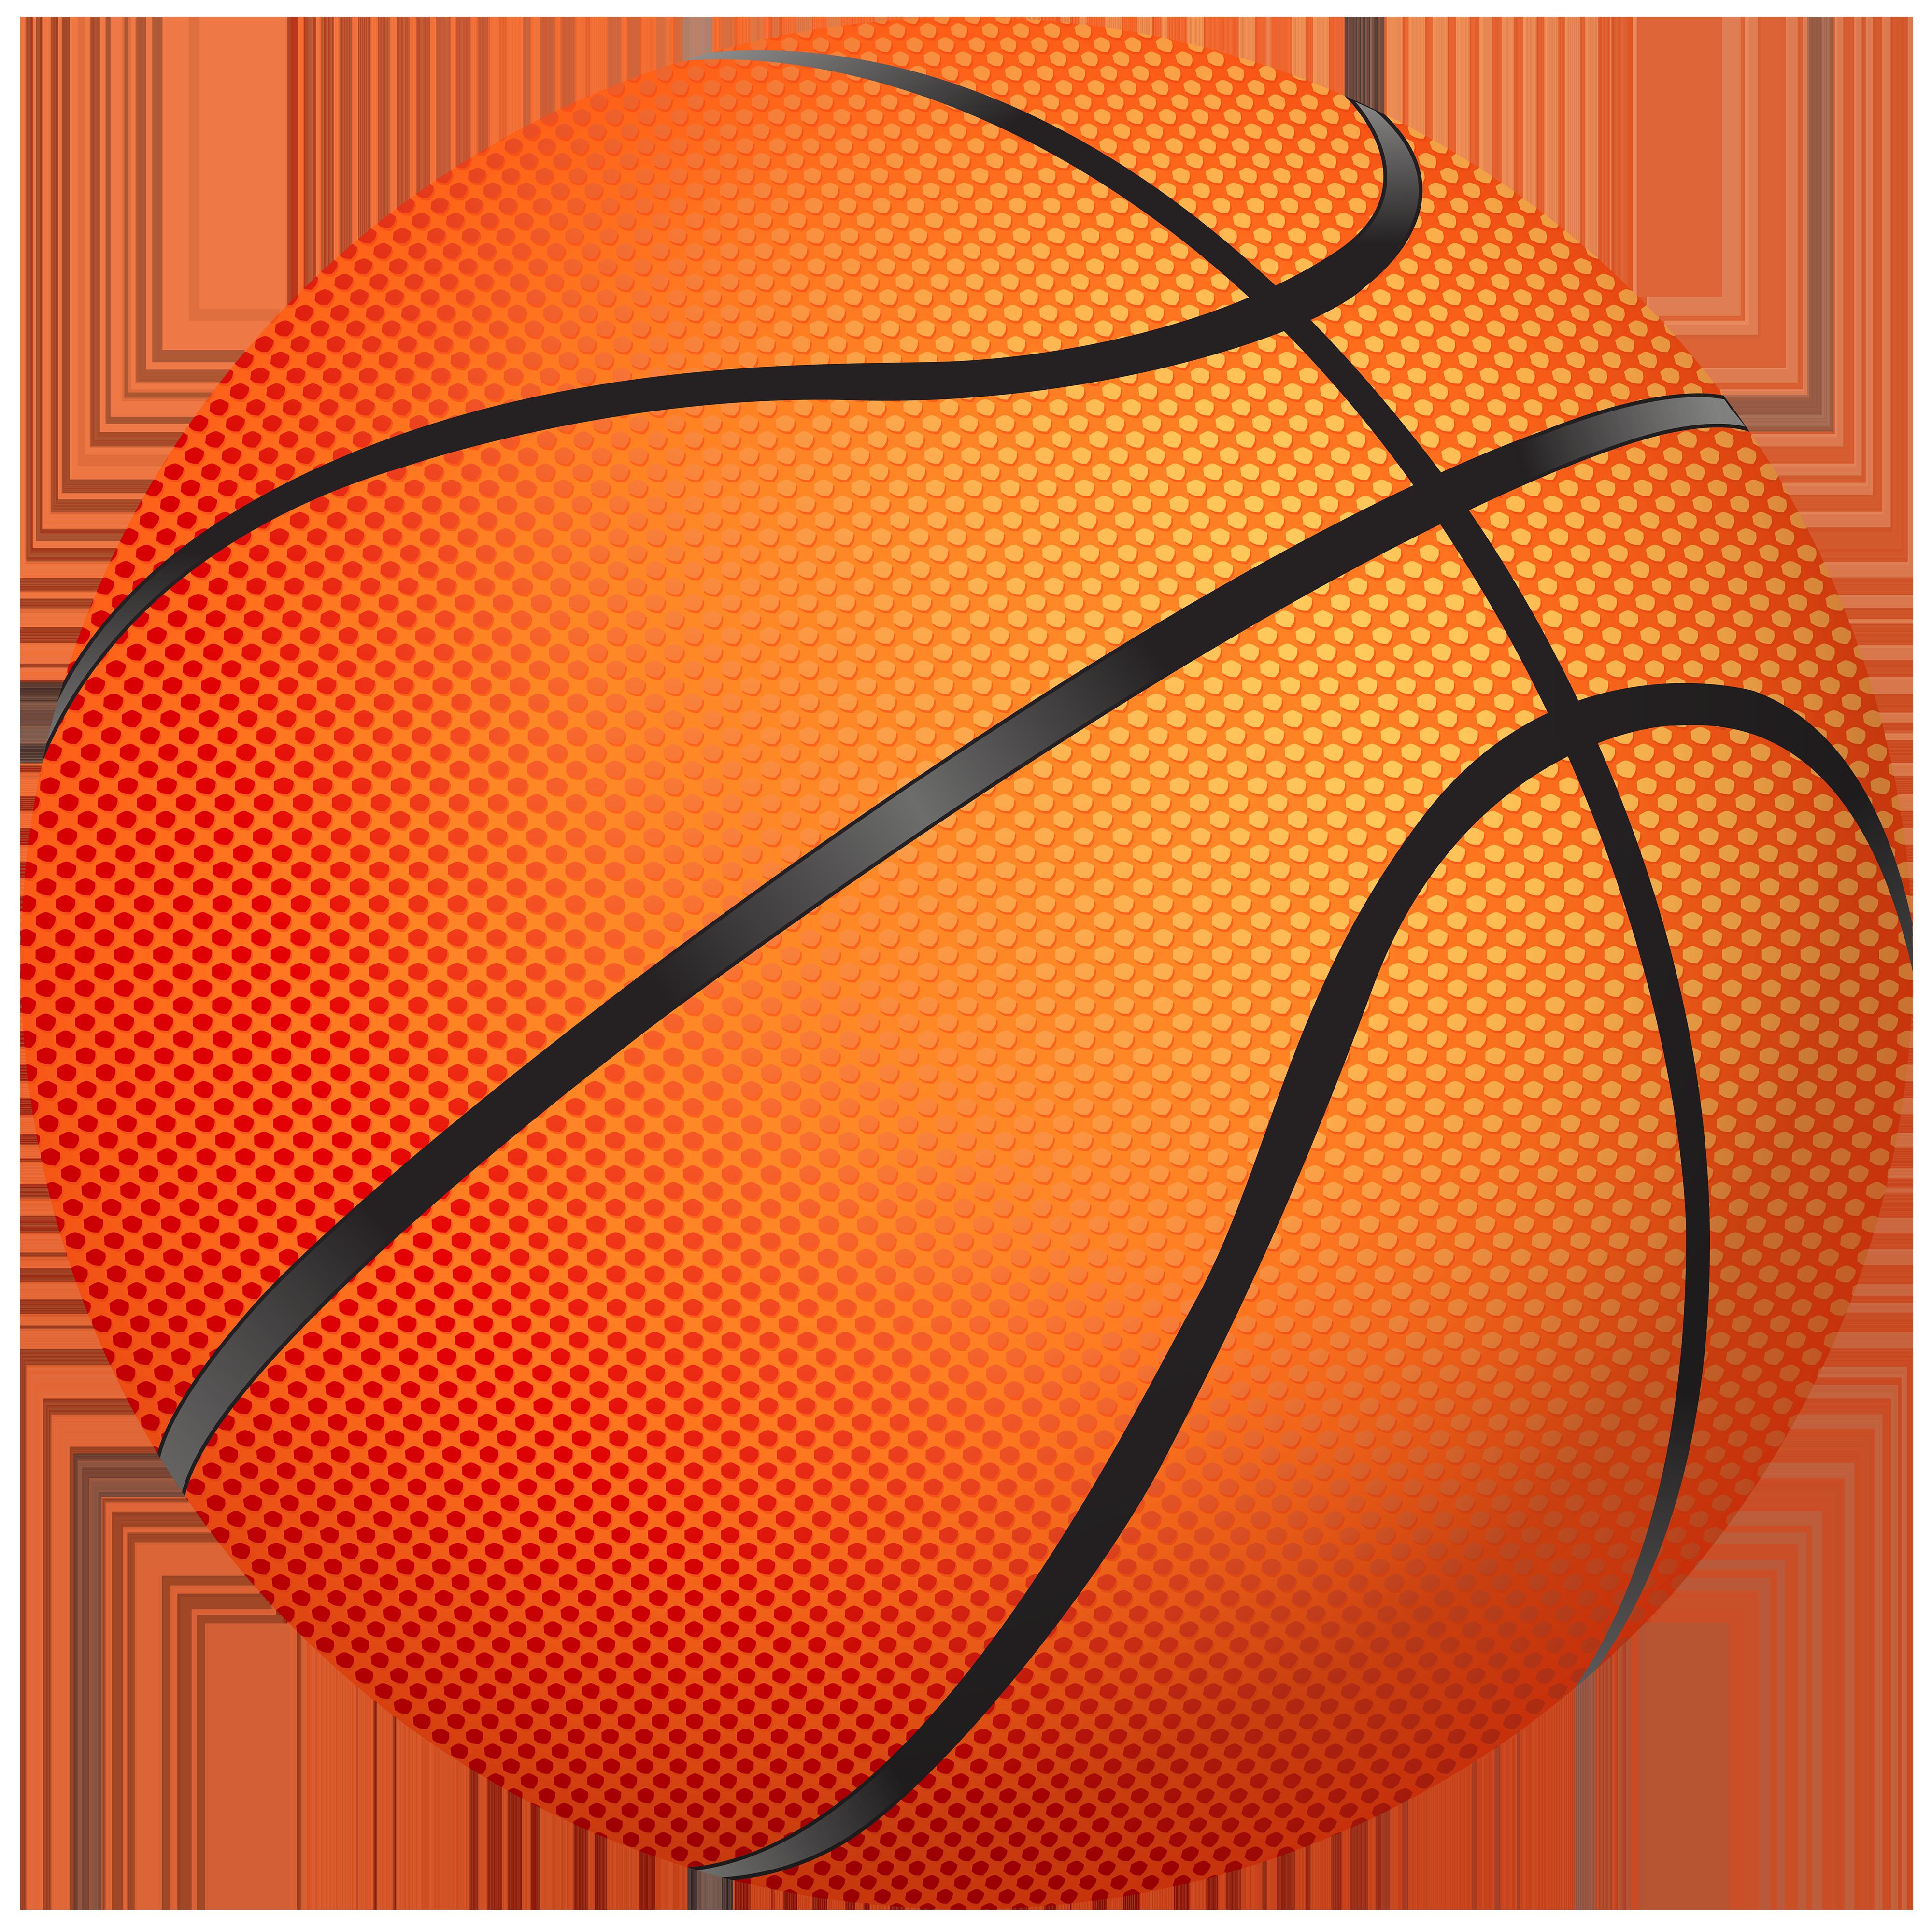 Bsaketball clipart banner royalty free Basketball PNG Clipart - Best WEB Clipart banner royalty free